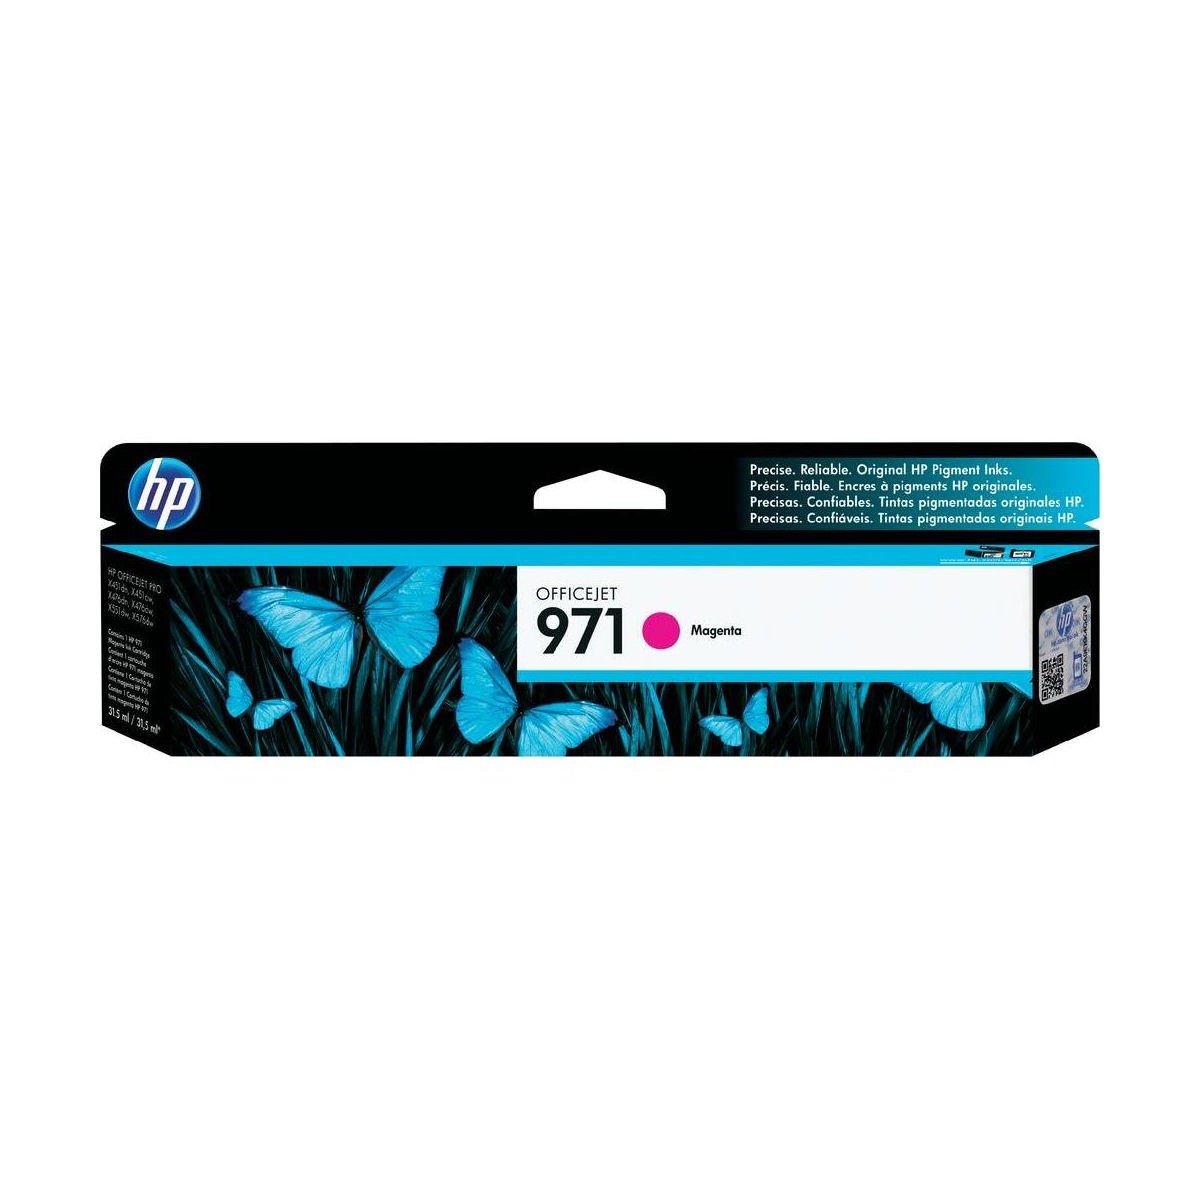 Hewlett Packard HP 971 Officejet Inkjet Cartridge Page Life 2500pp Magenta Ref CN623AE